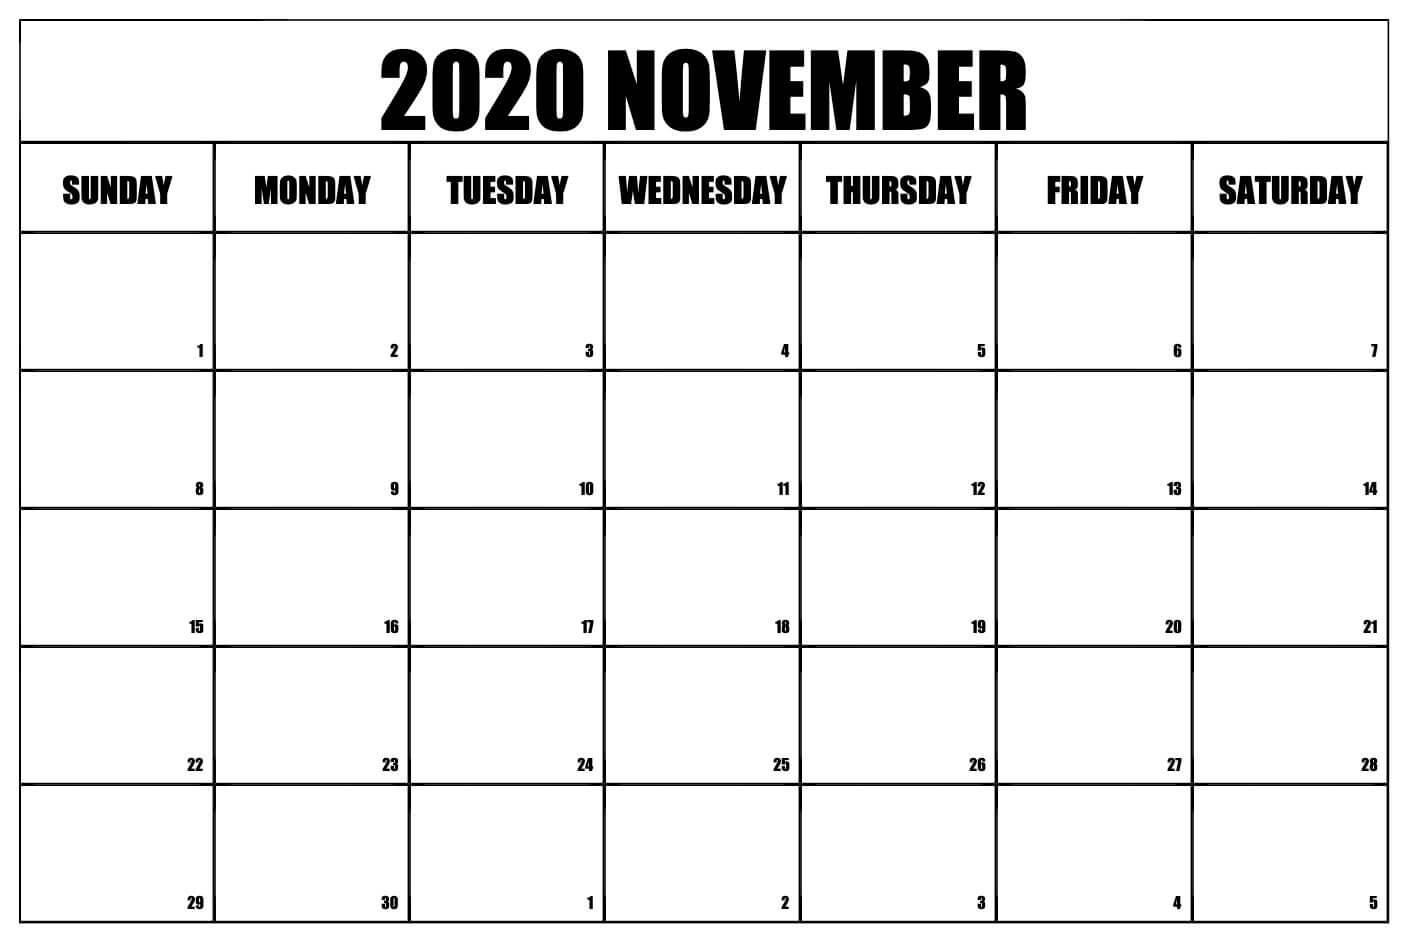 November 2020 Calendar Blank